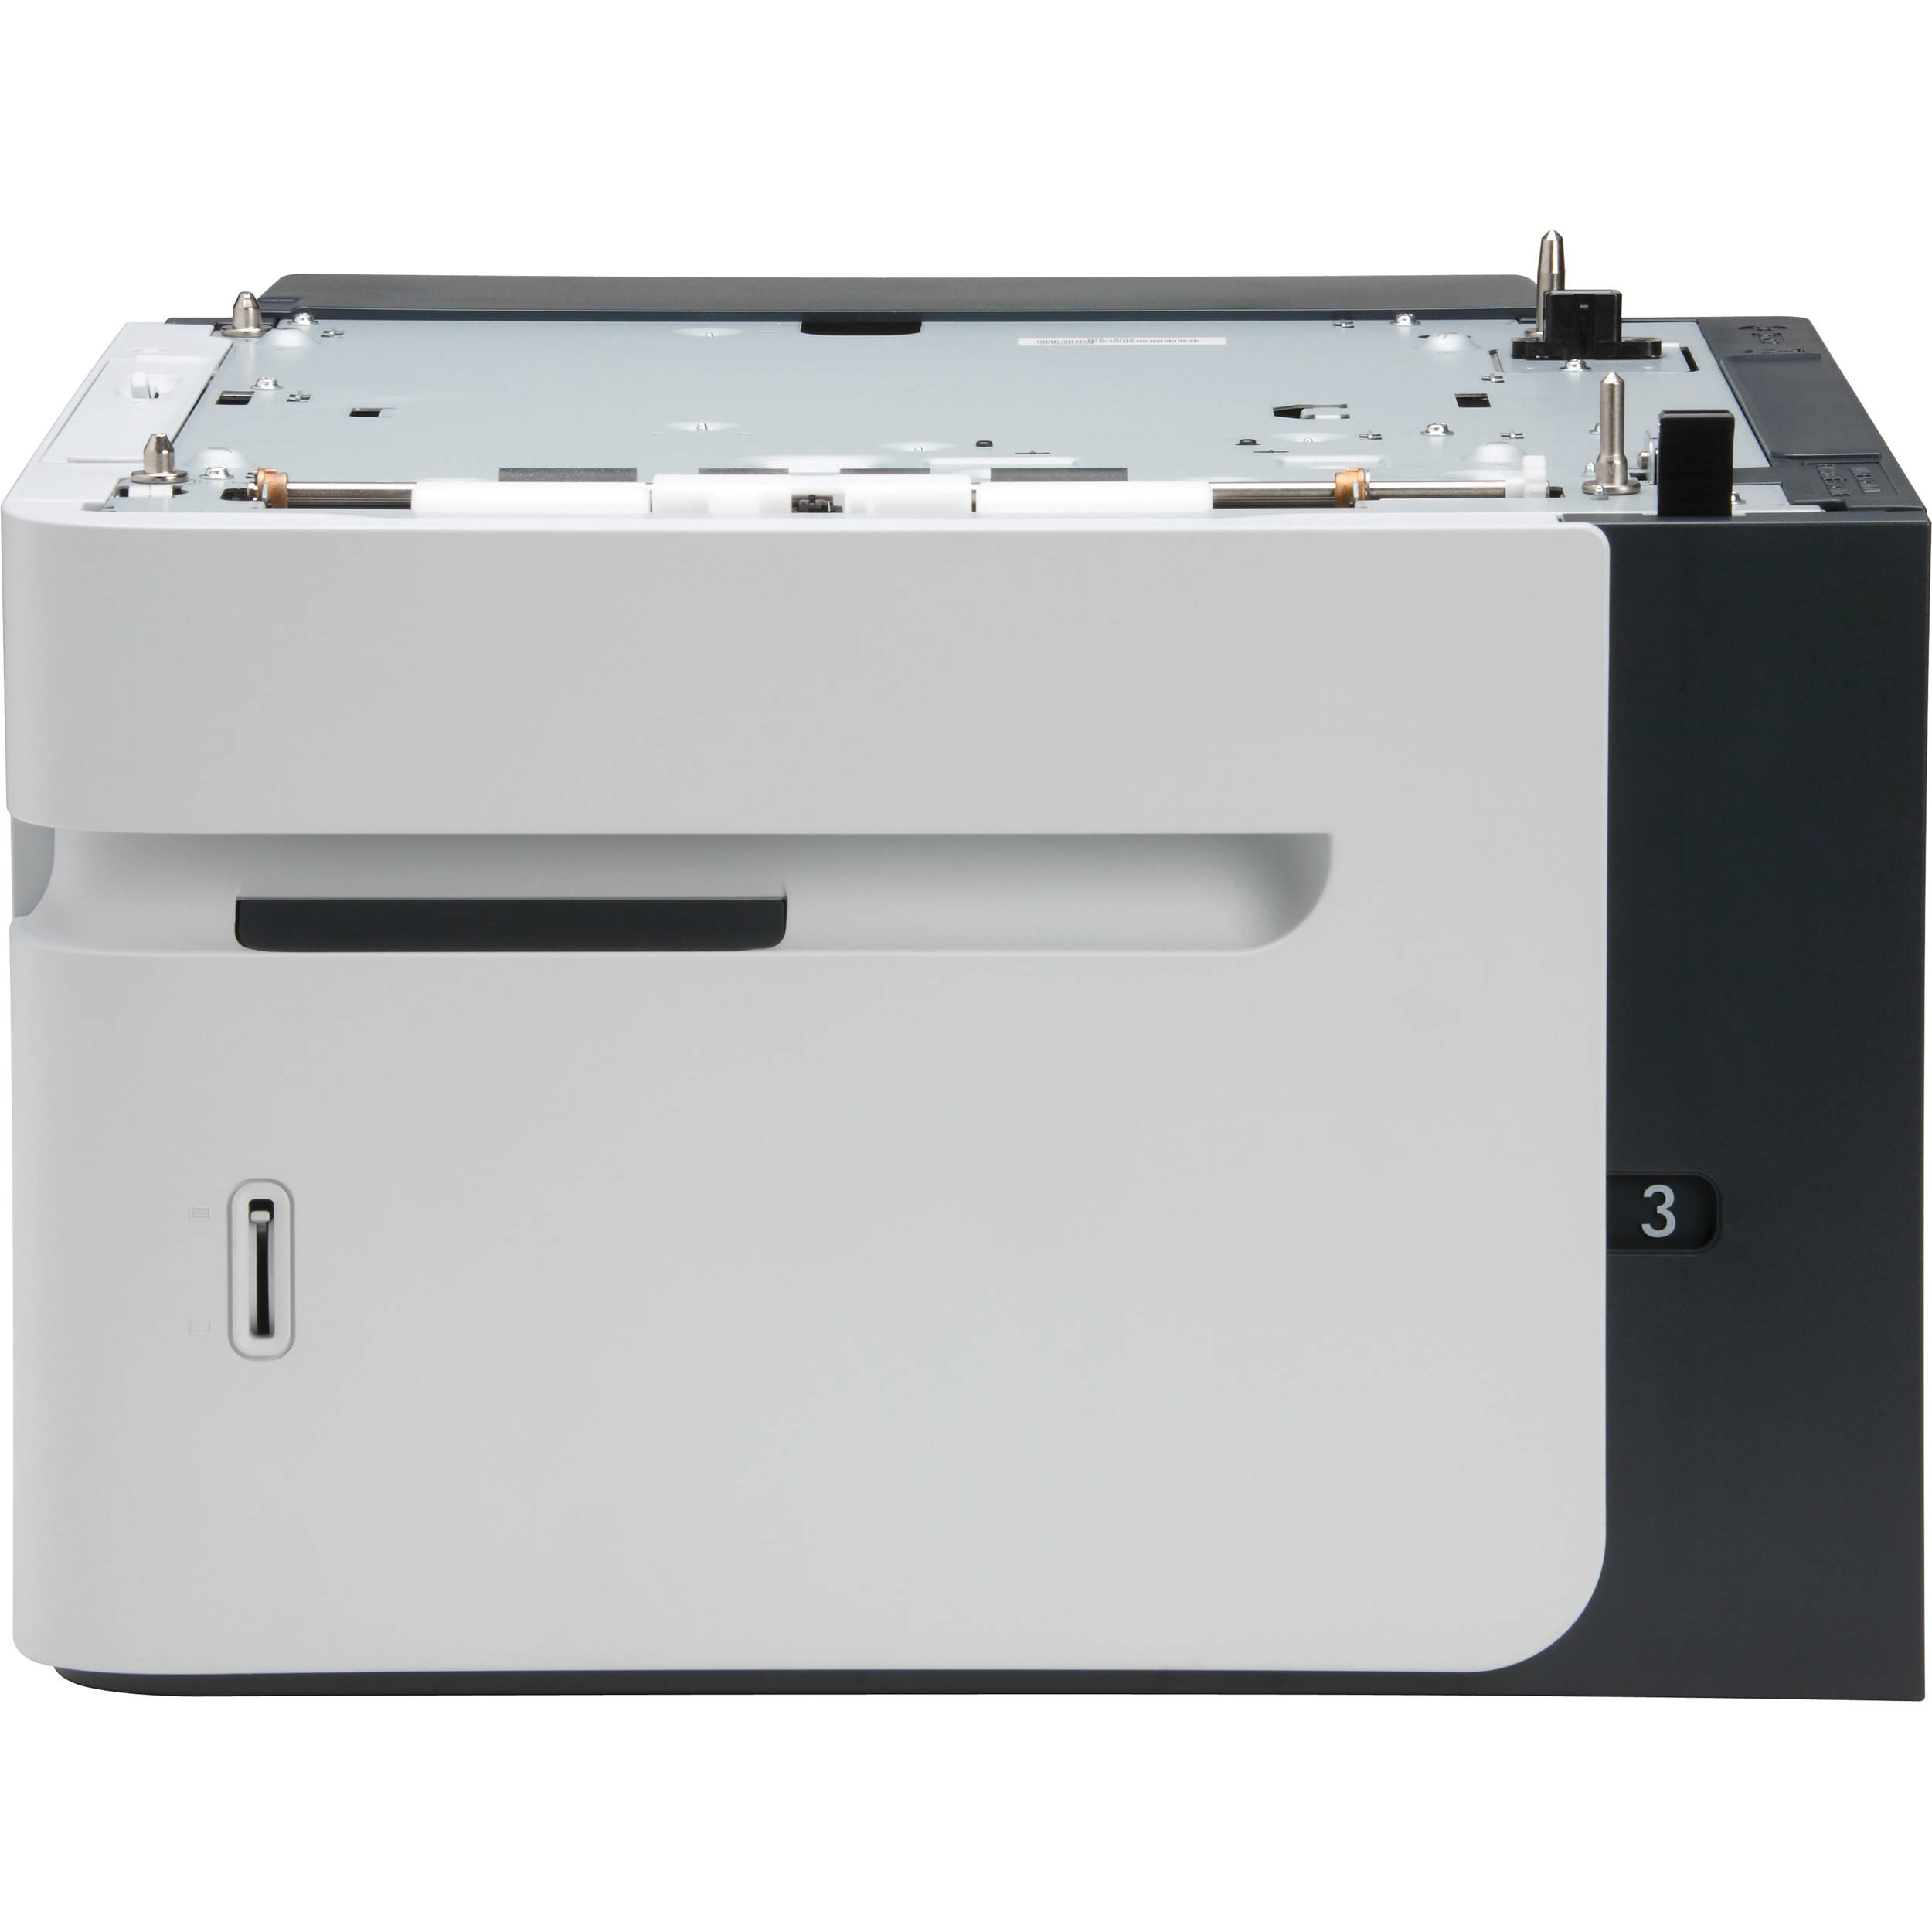 HP LASERJET 1500 PRINTER 64BIT DRIVER DOWNLOAD